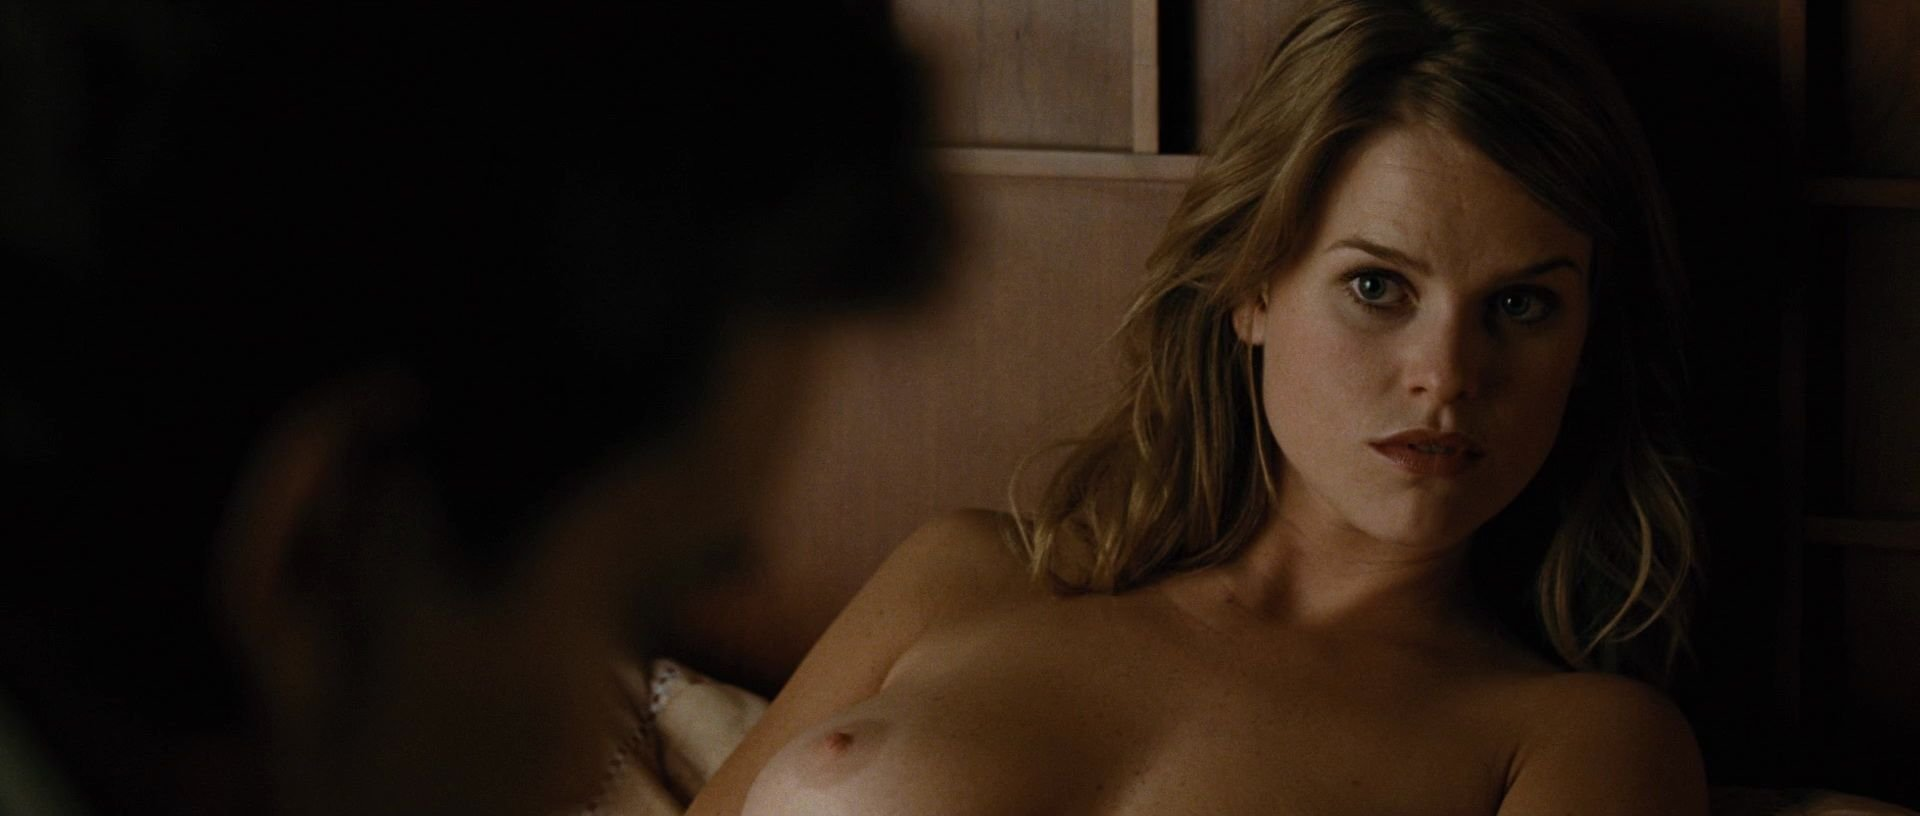 Eve Nude alice eve nude – crossing over (2009) hd 1080p | #thefappening